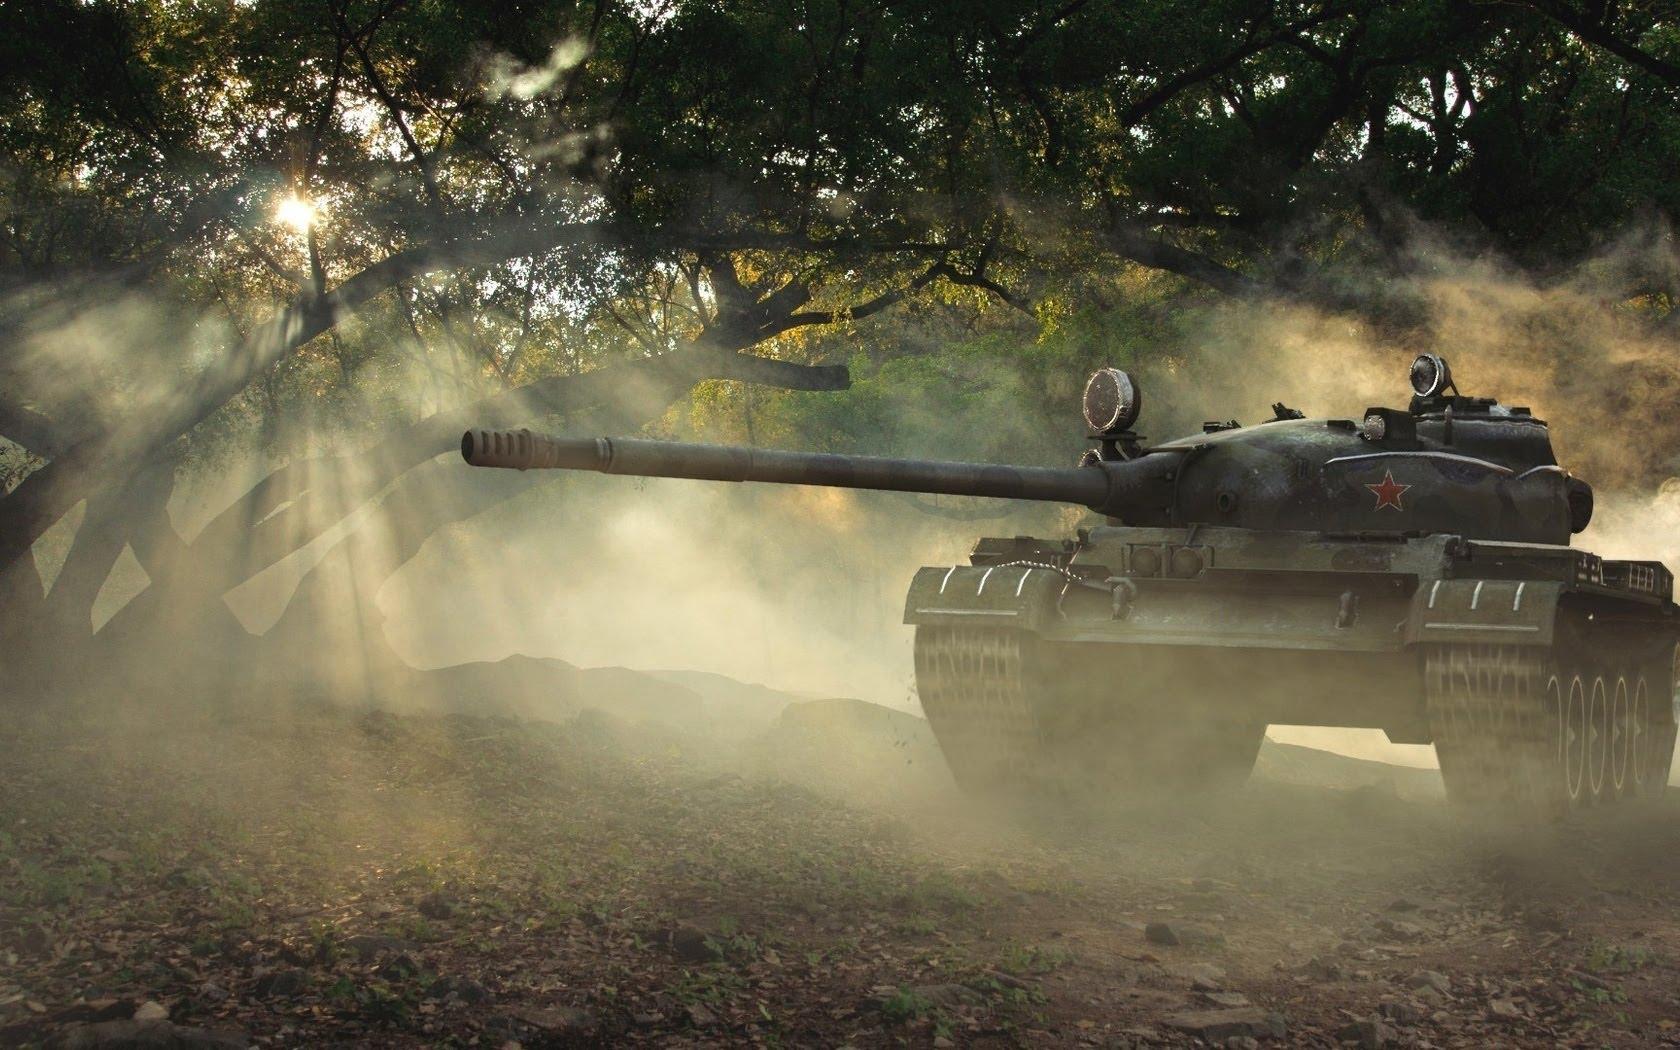 фон картинки для мира танков яблок глянцевая